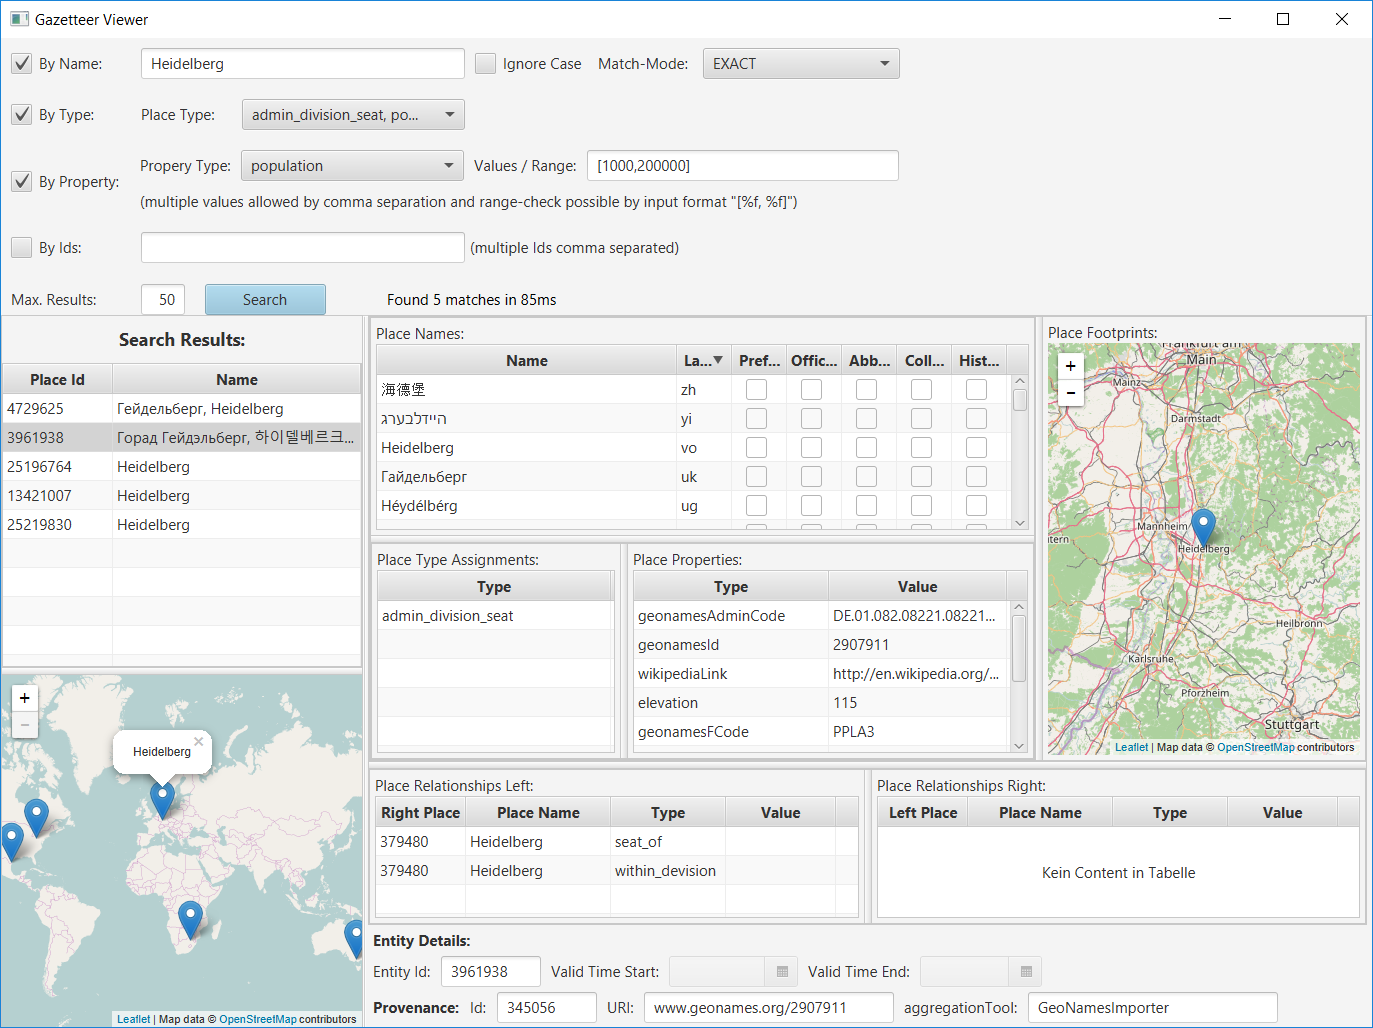 Demo Screenshot of the Gazetteer Viewer